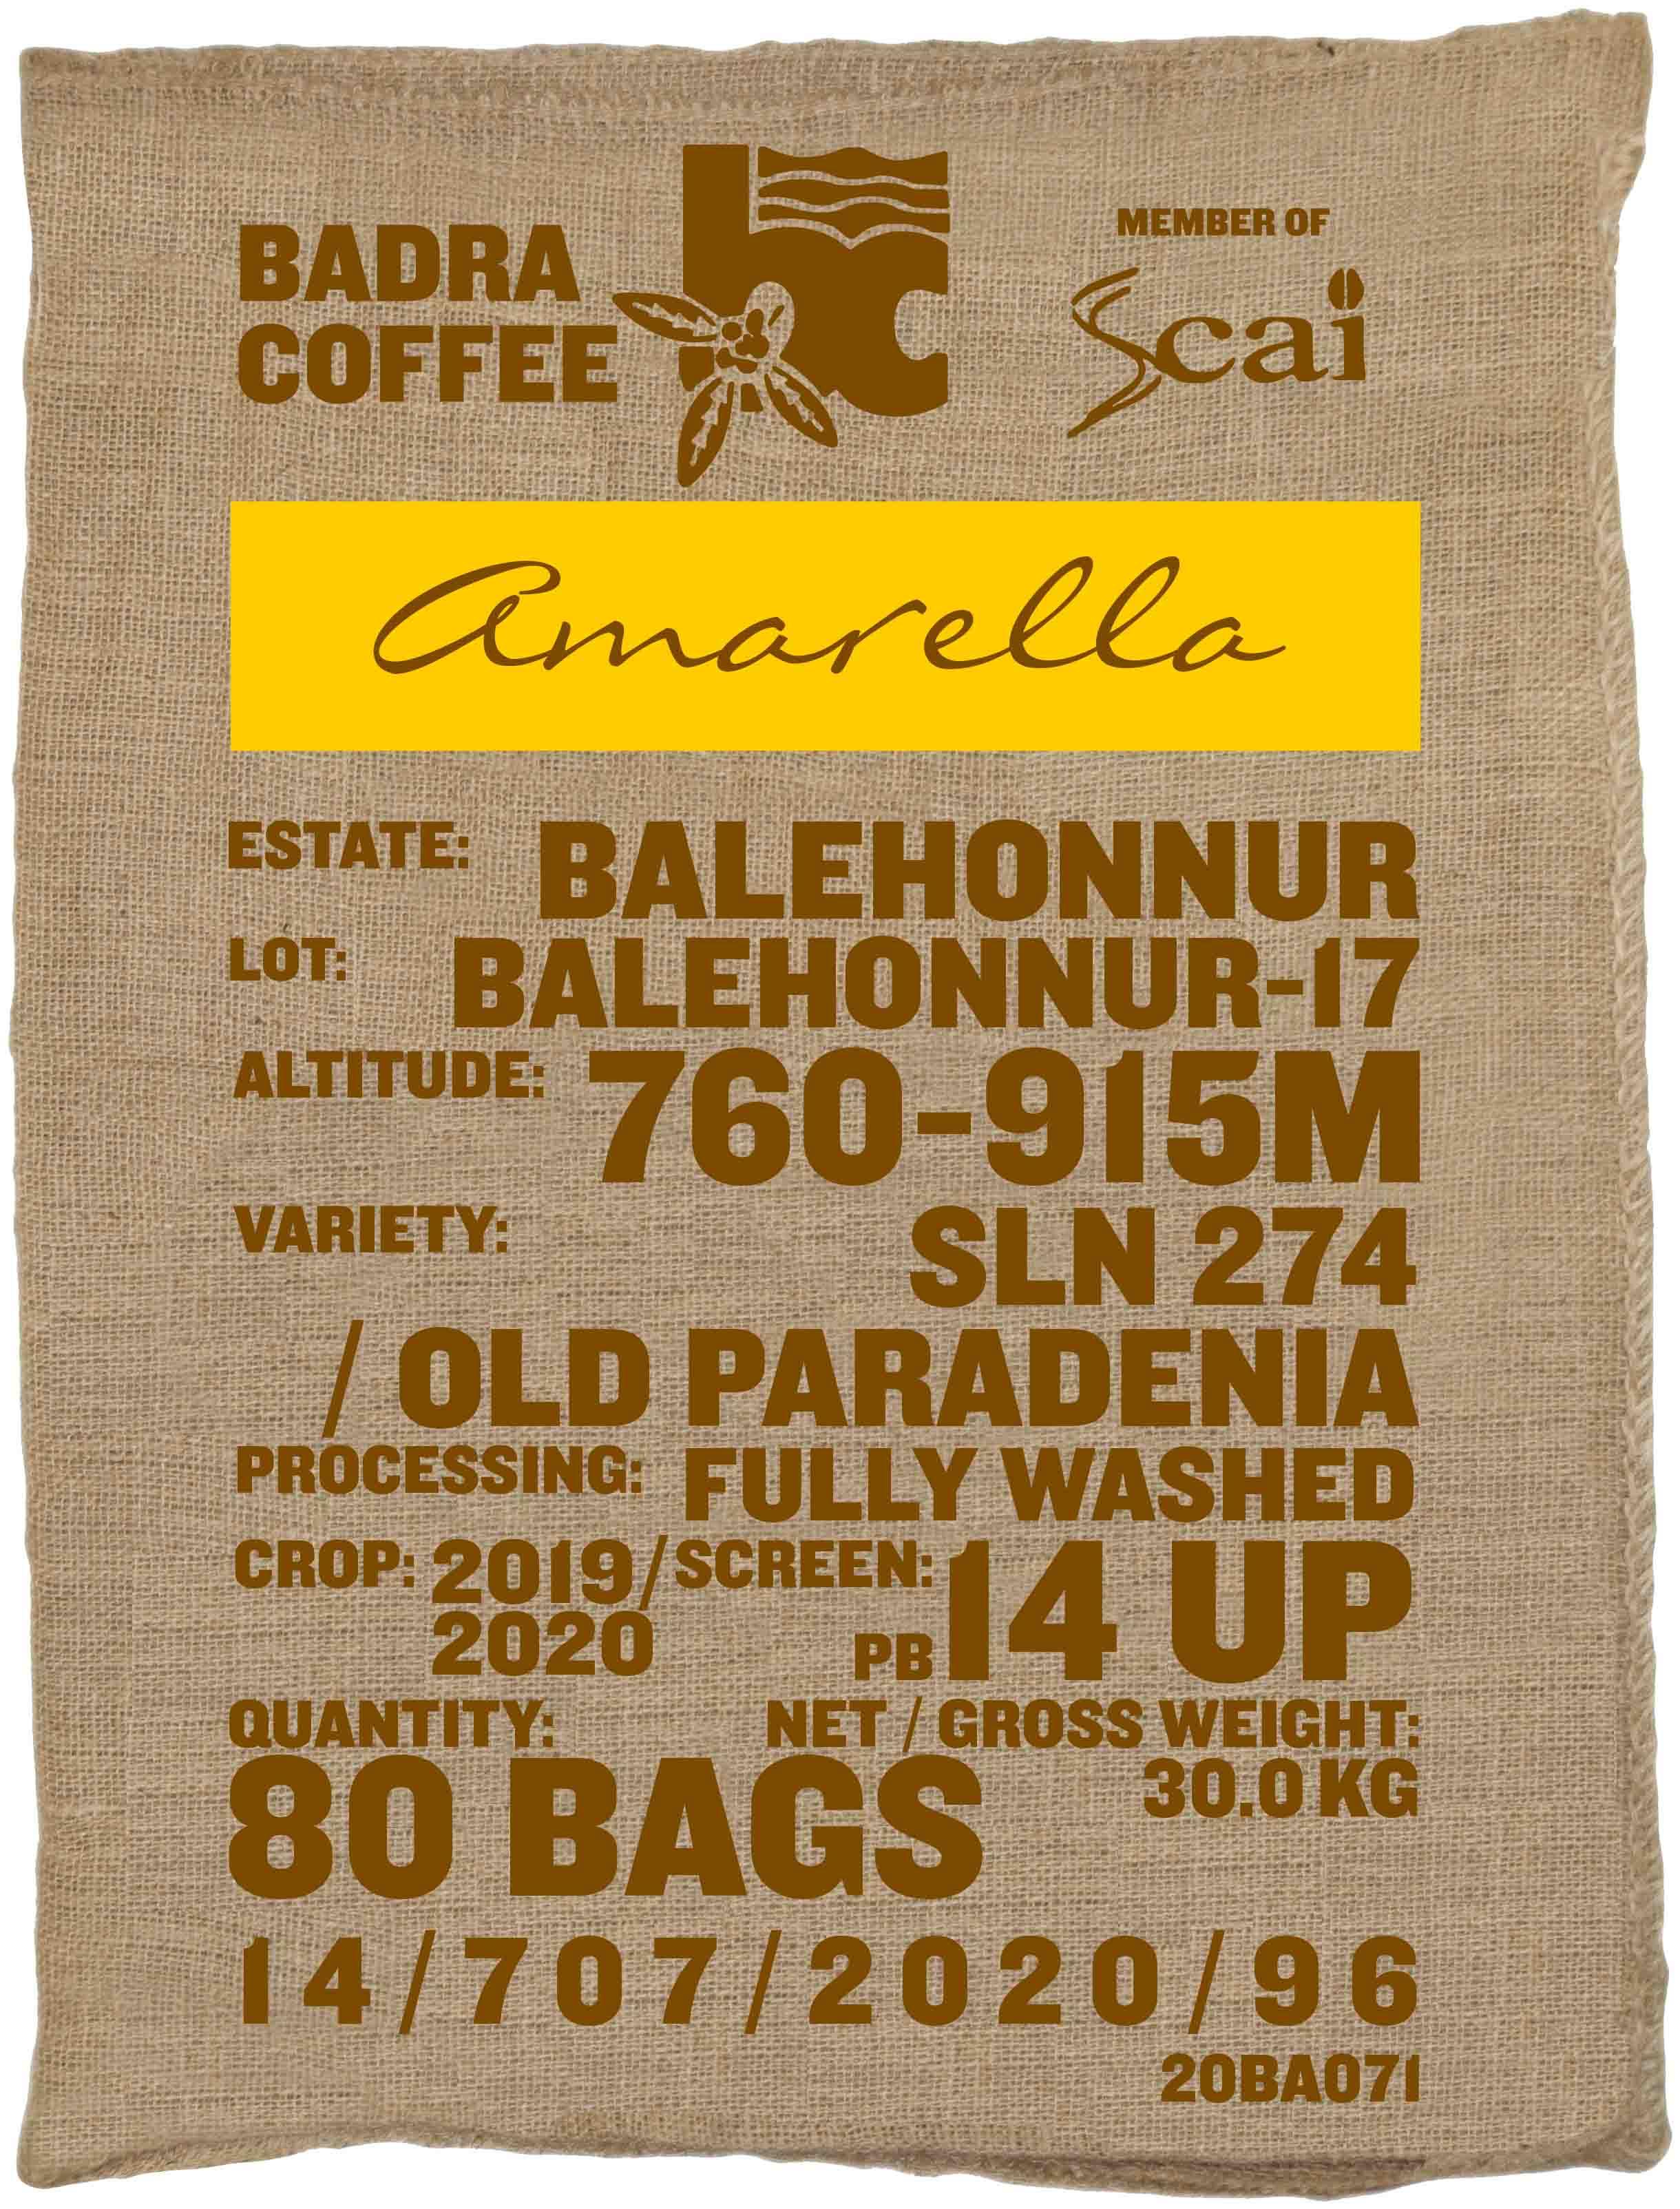 Ein Rohkaffeesack amarella Parzellenkaffee Varietät SLN 274/Old Paradenia. Badra Estates Lot Balehonnur 17.